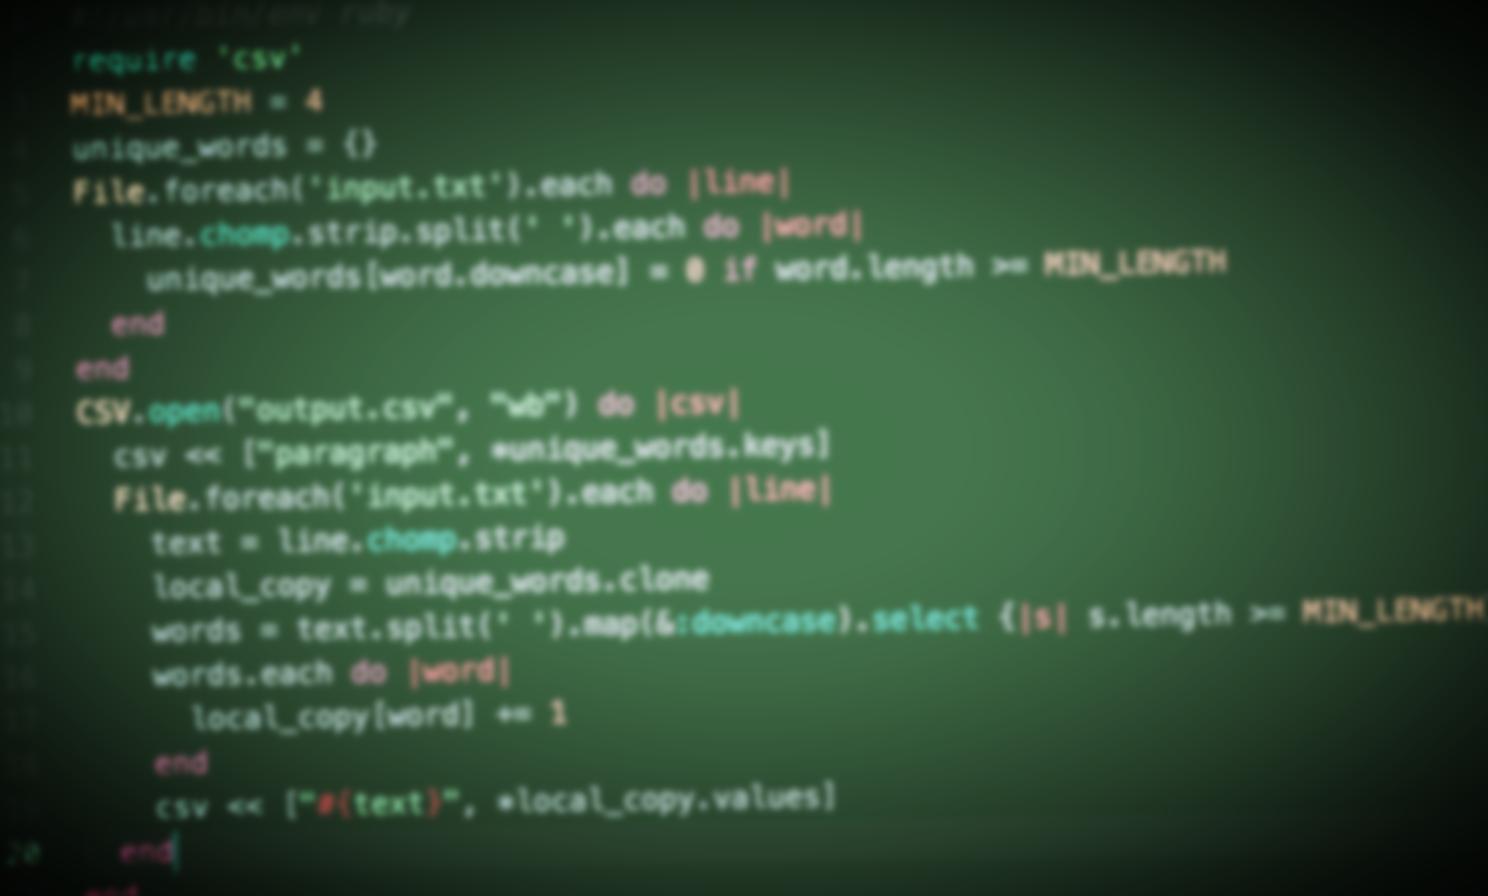 A Code